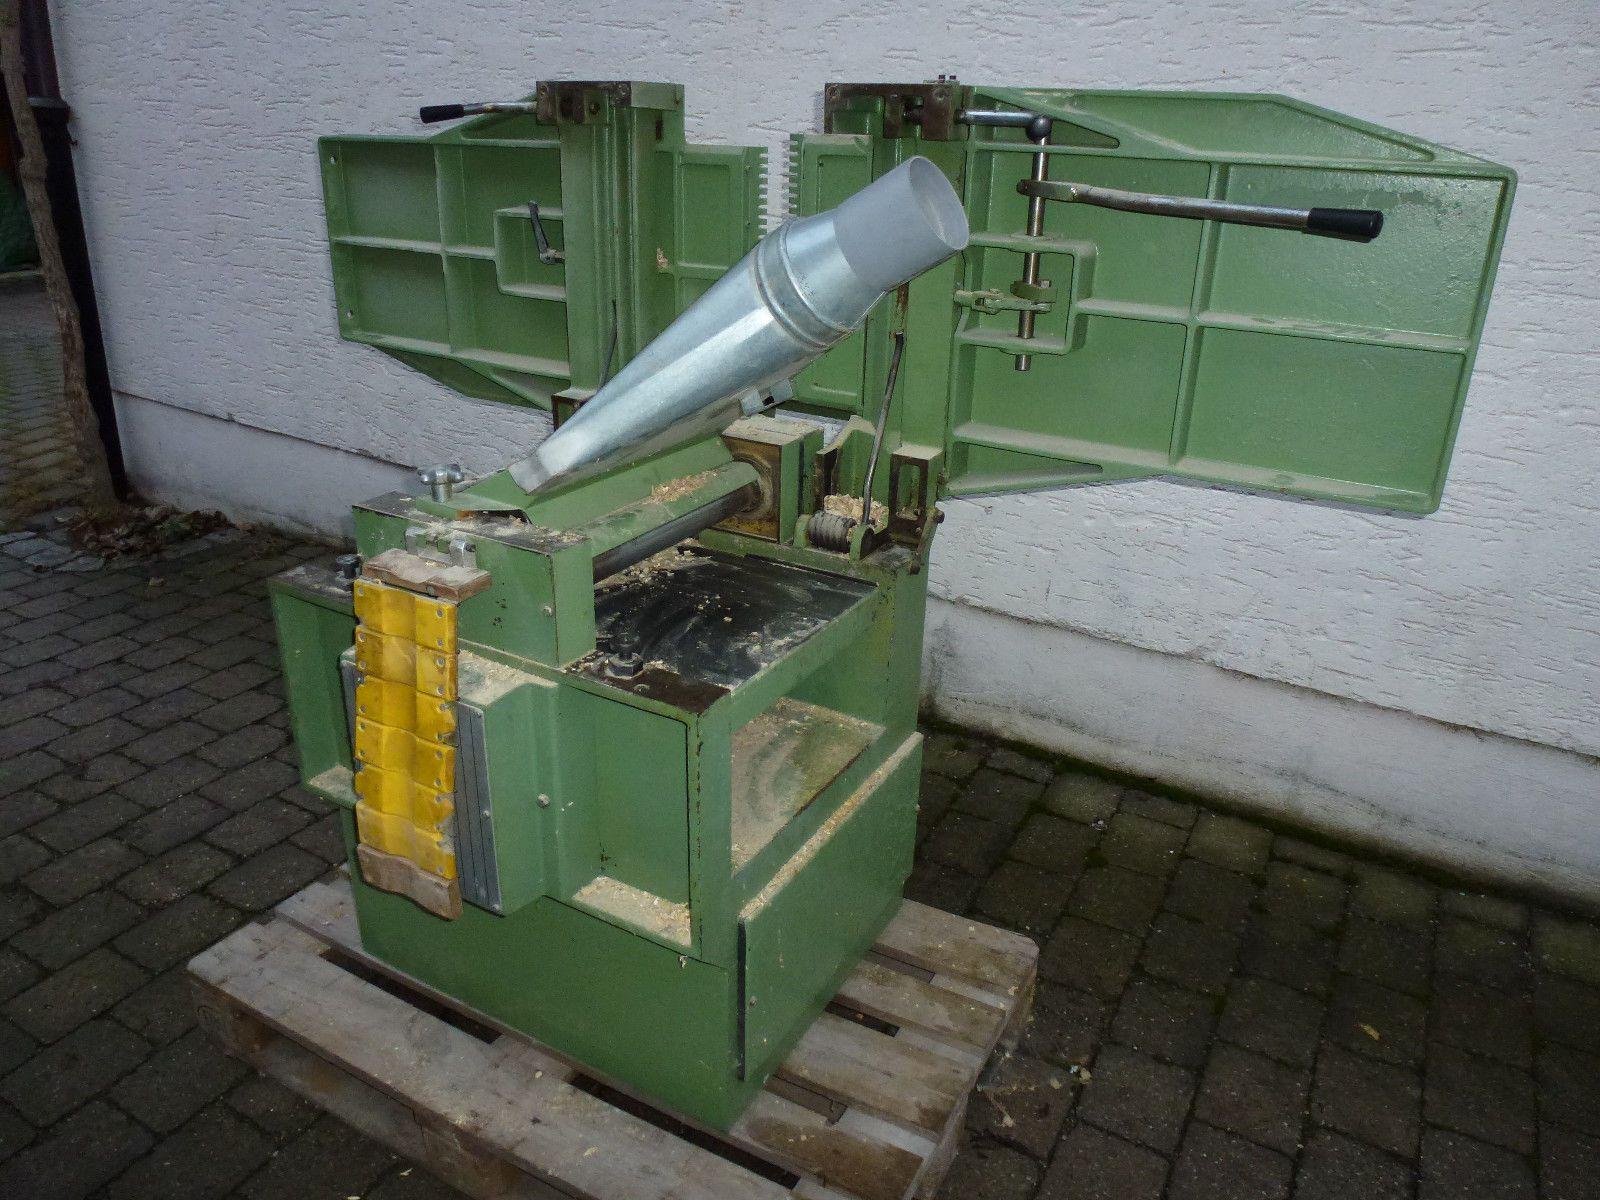 kombinierte Hobelmaschine, Abrichte, Dickenhobelmaschine